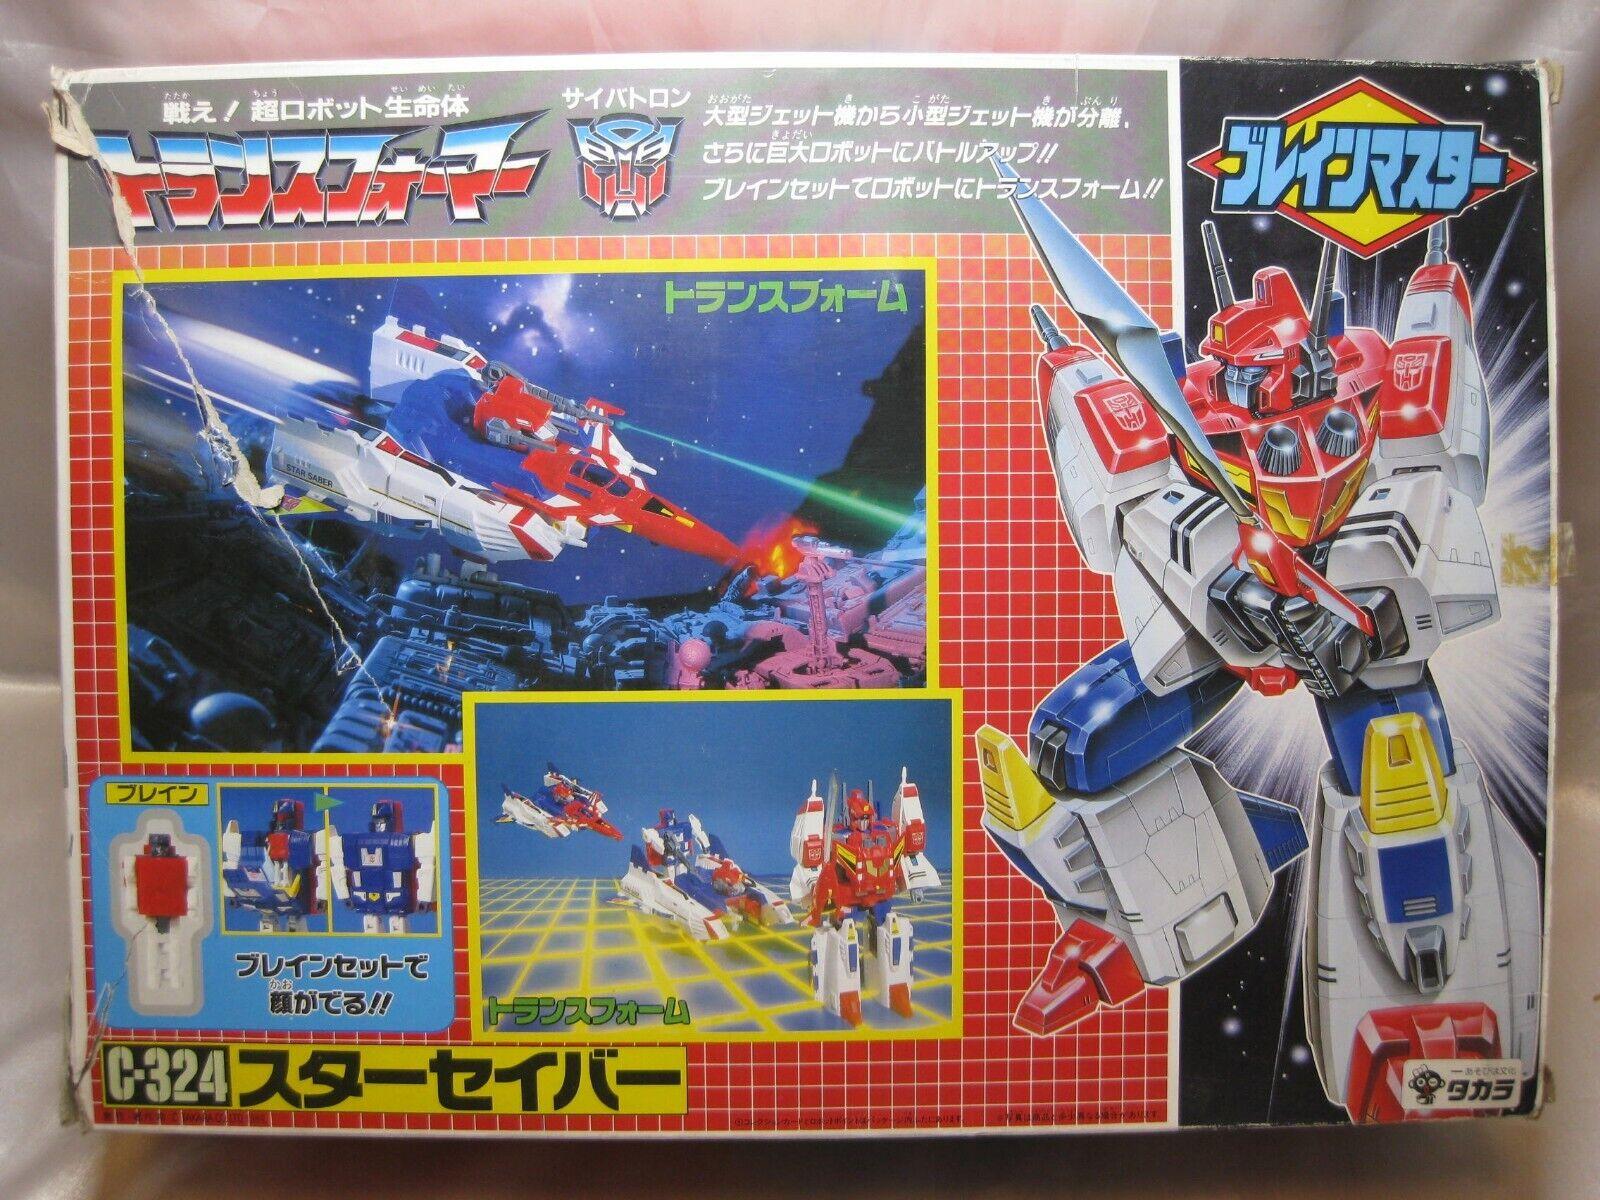 Very Rare trans formers G1 G1 G1 C-324 Star Saber initial design box 1989 Takara 41a6f3